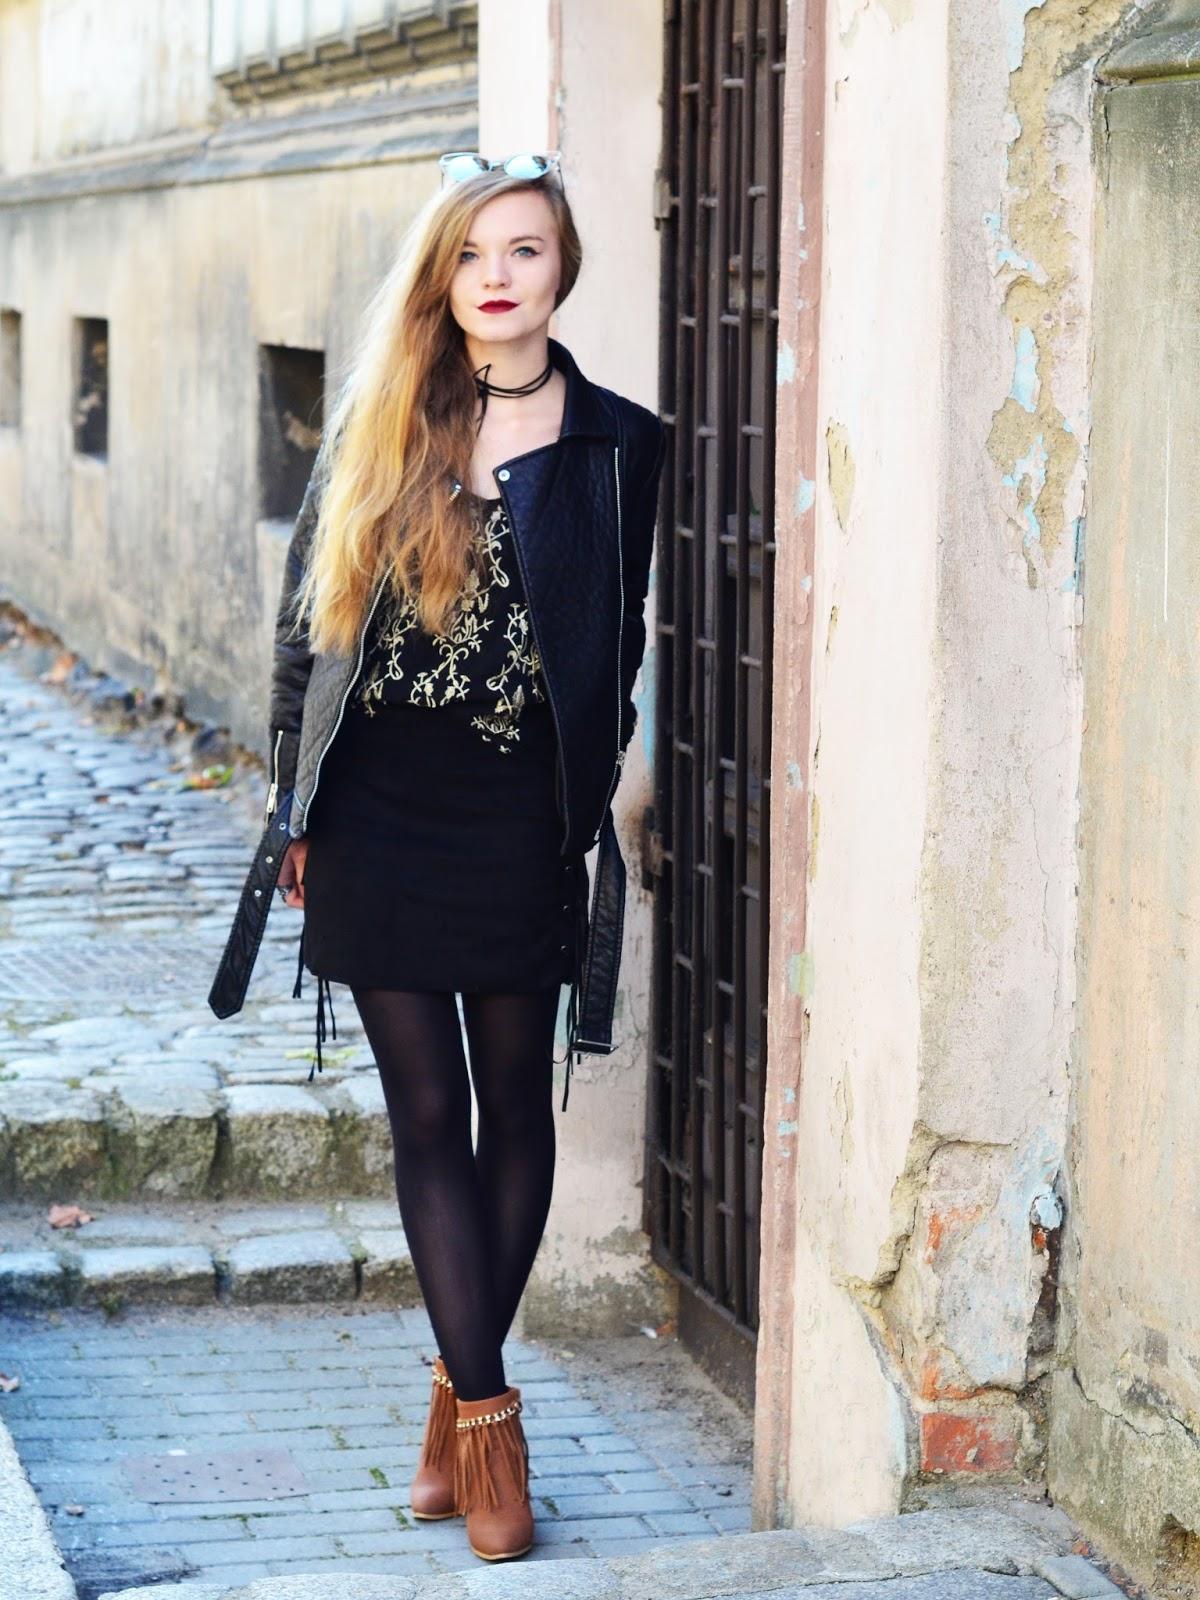 Street style legwear looks diane-fashion.blogspot.co.uk